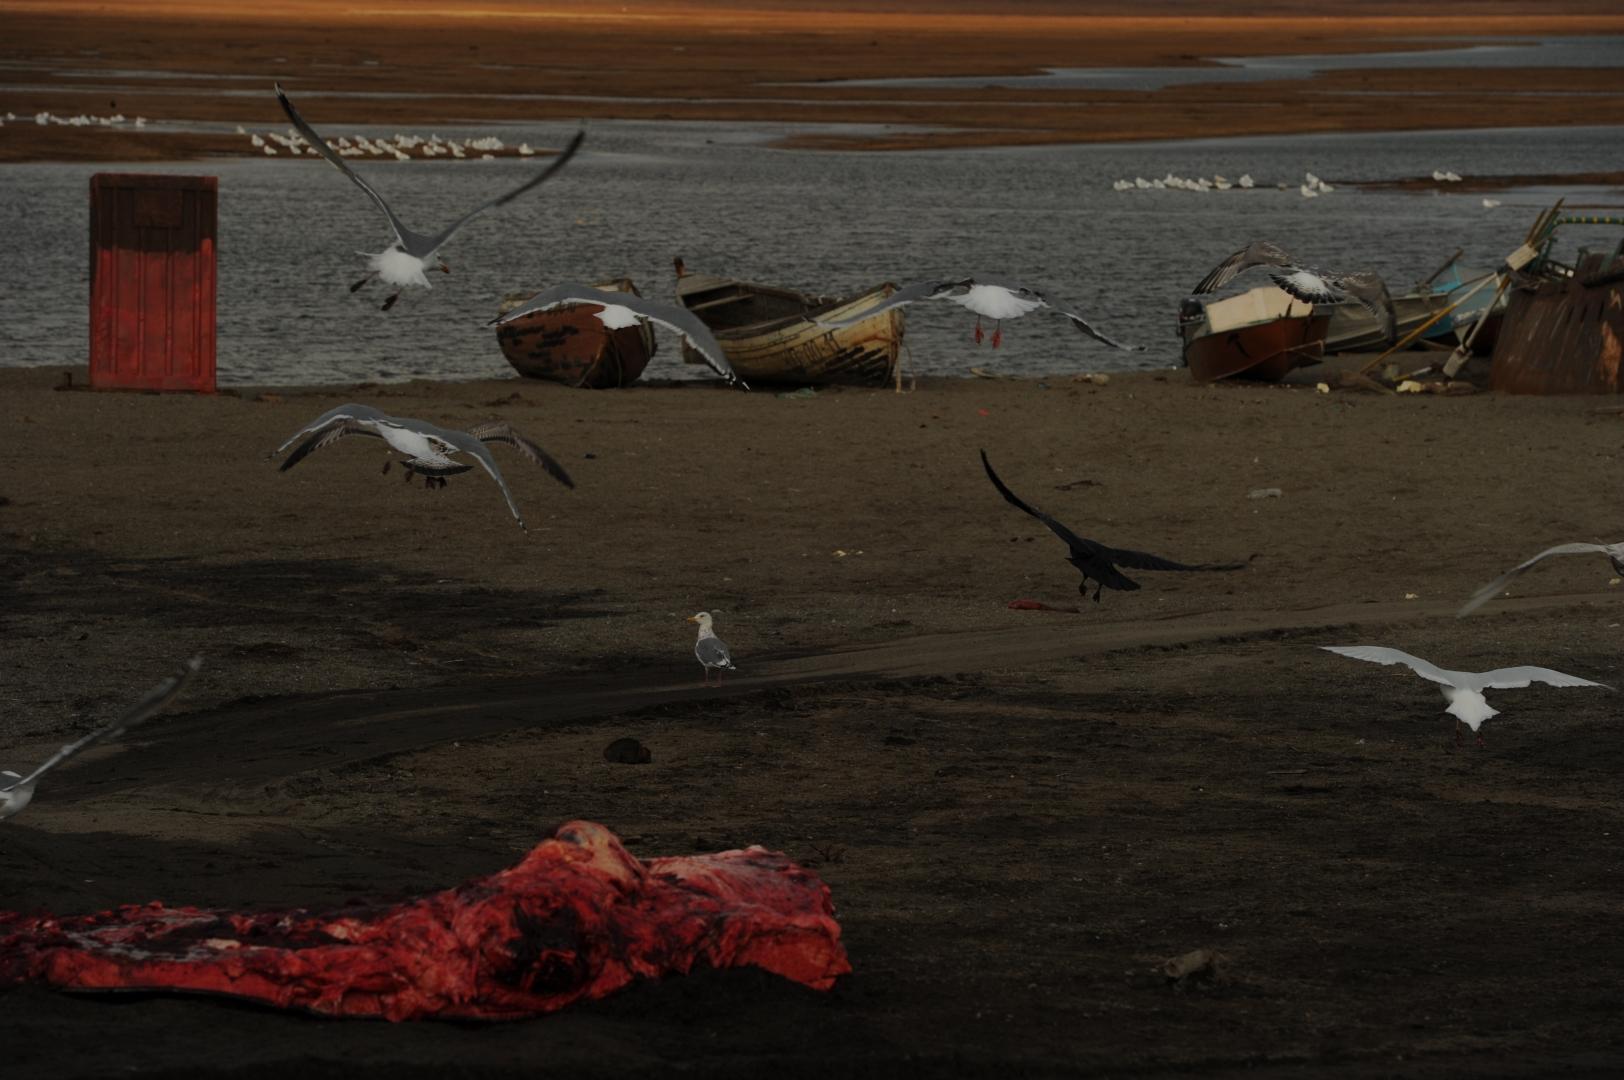 Фрагмент побережья с лодками для охоты